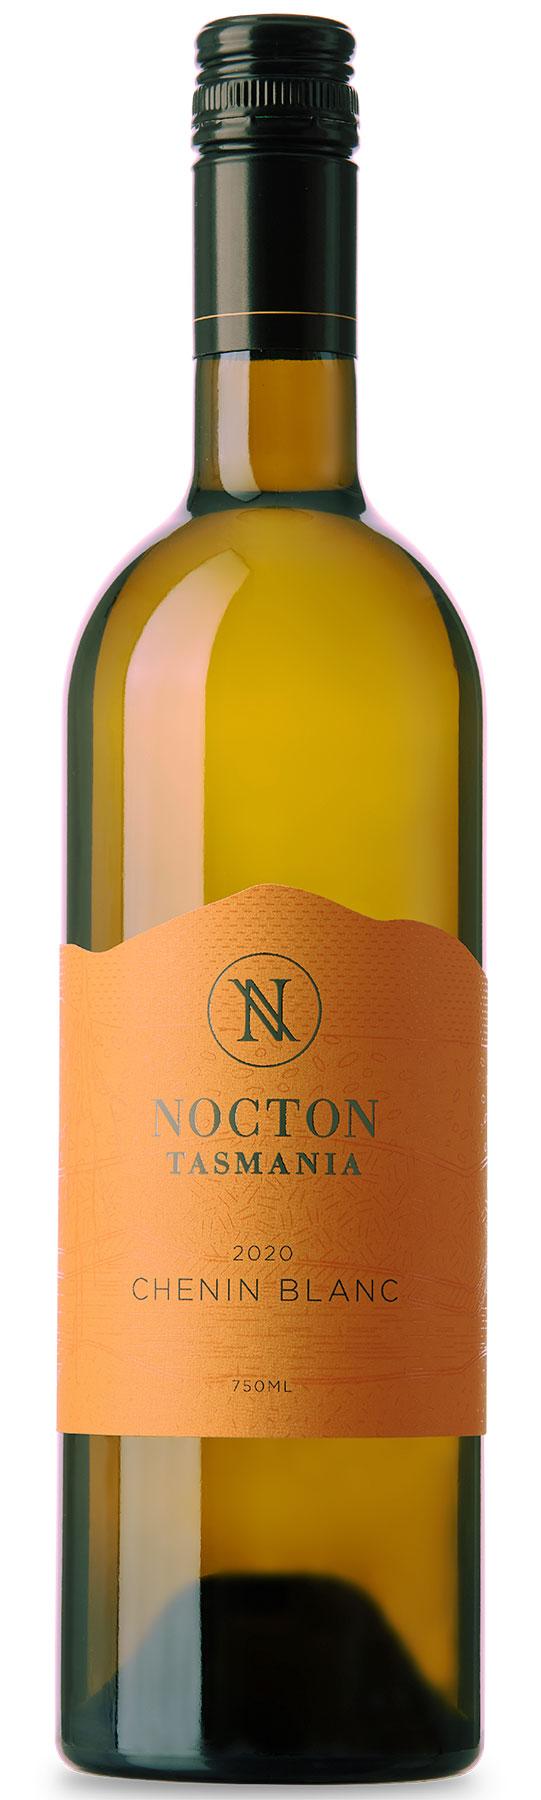 Nocton_Estate_Chenin_Blanc_2020